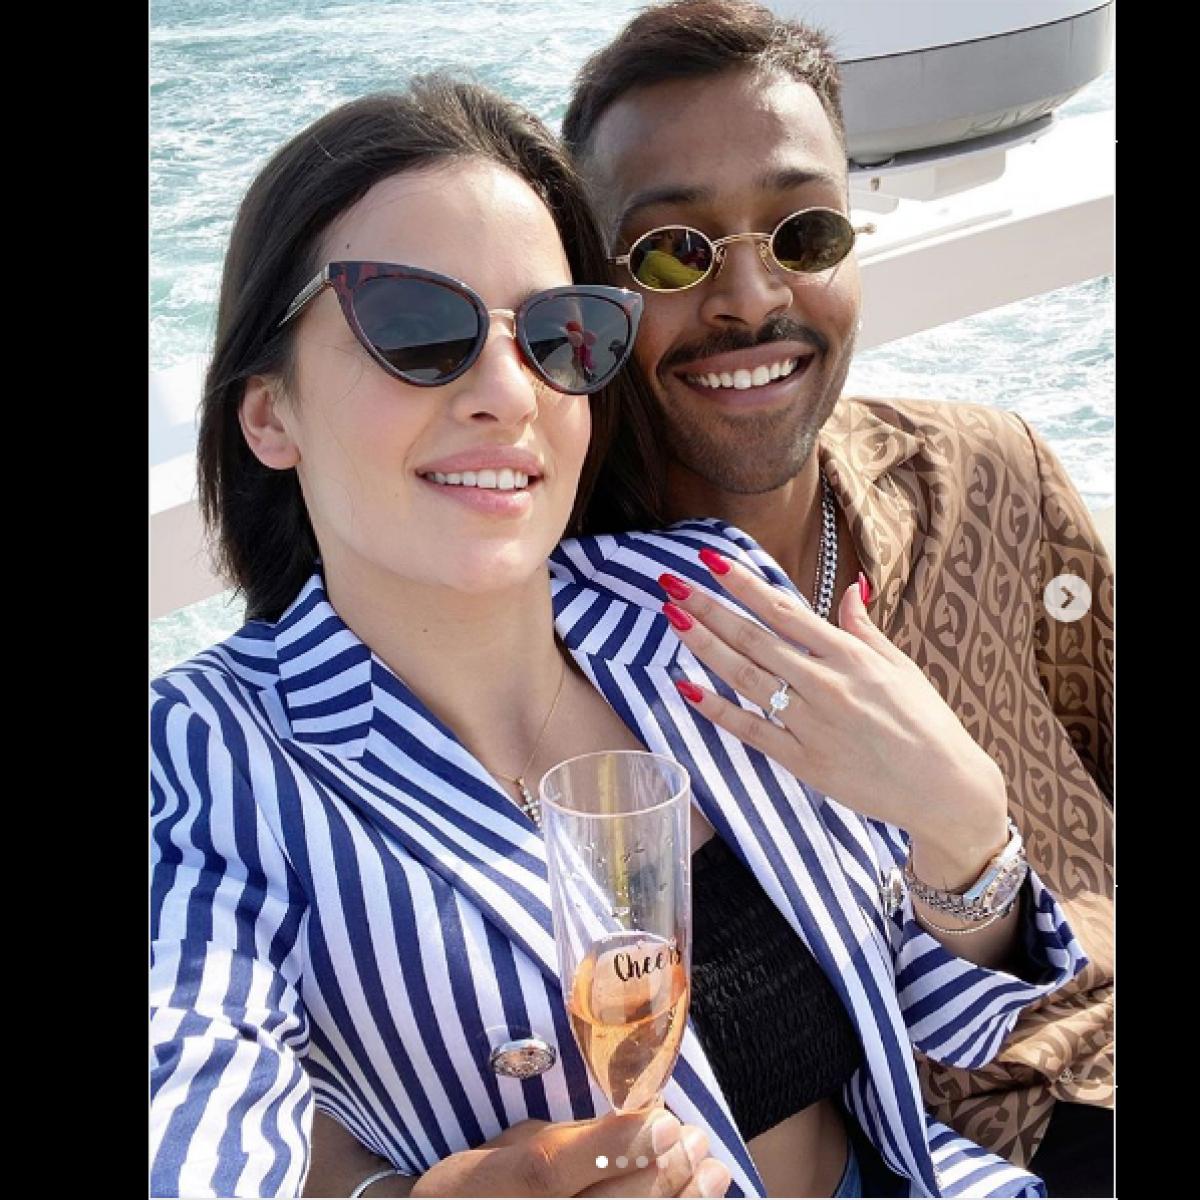 'Mai tera, tu meri': Hardik Pandya gets engaged to Nataša Stanković; watch video of proposal